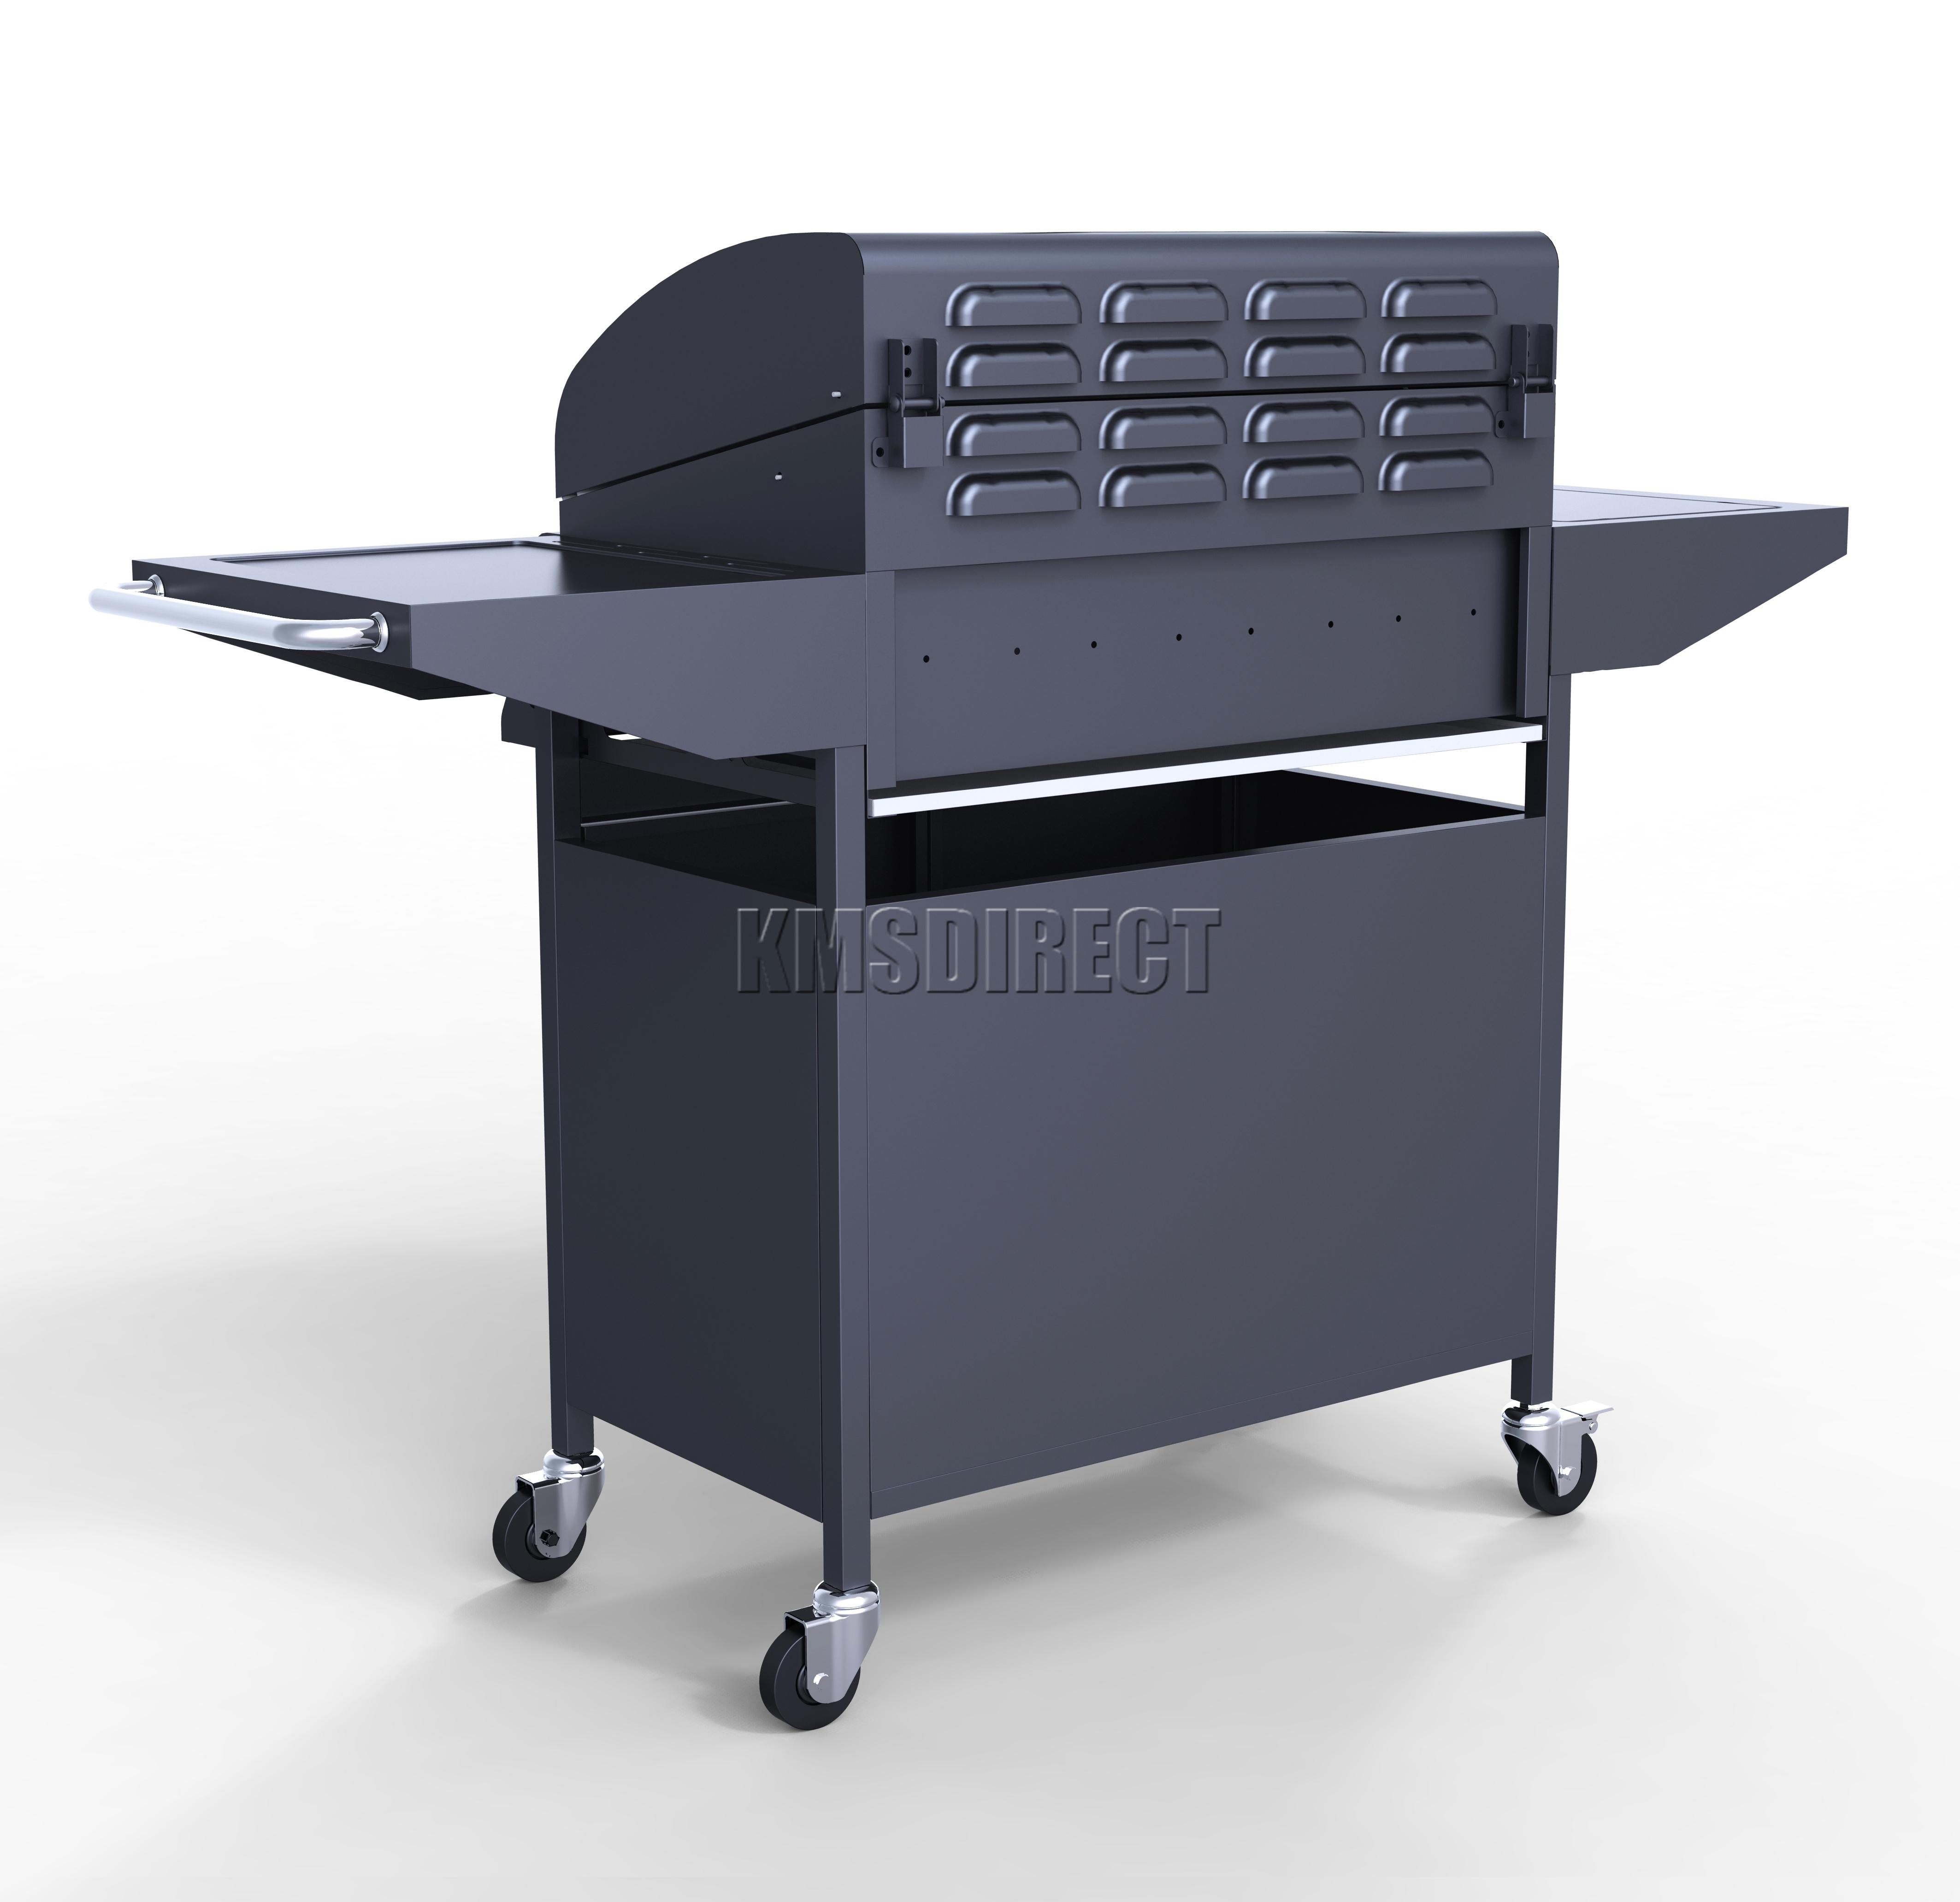 Foxhunter g a burner bbq gas grill black steel